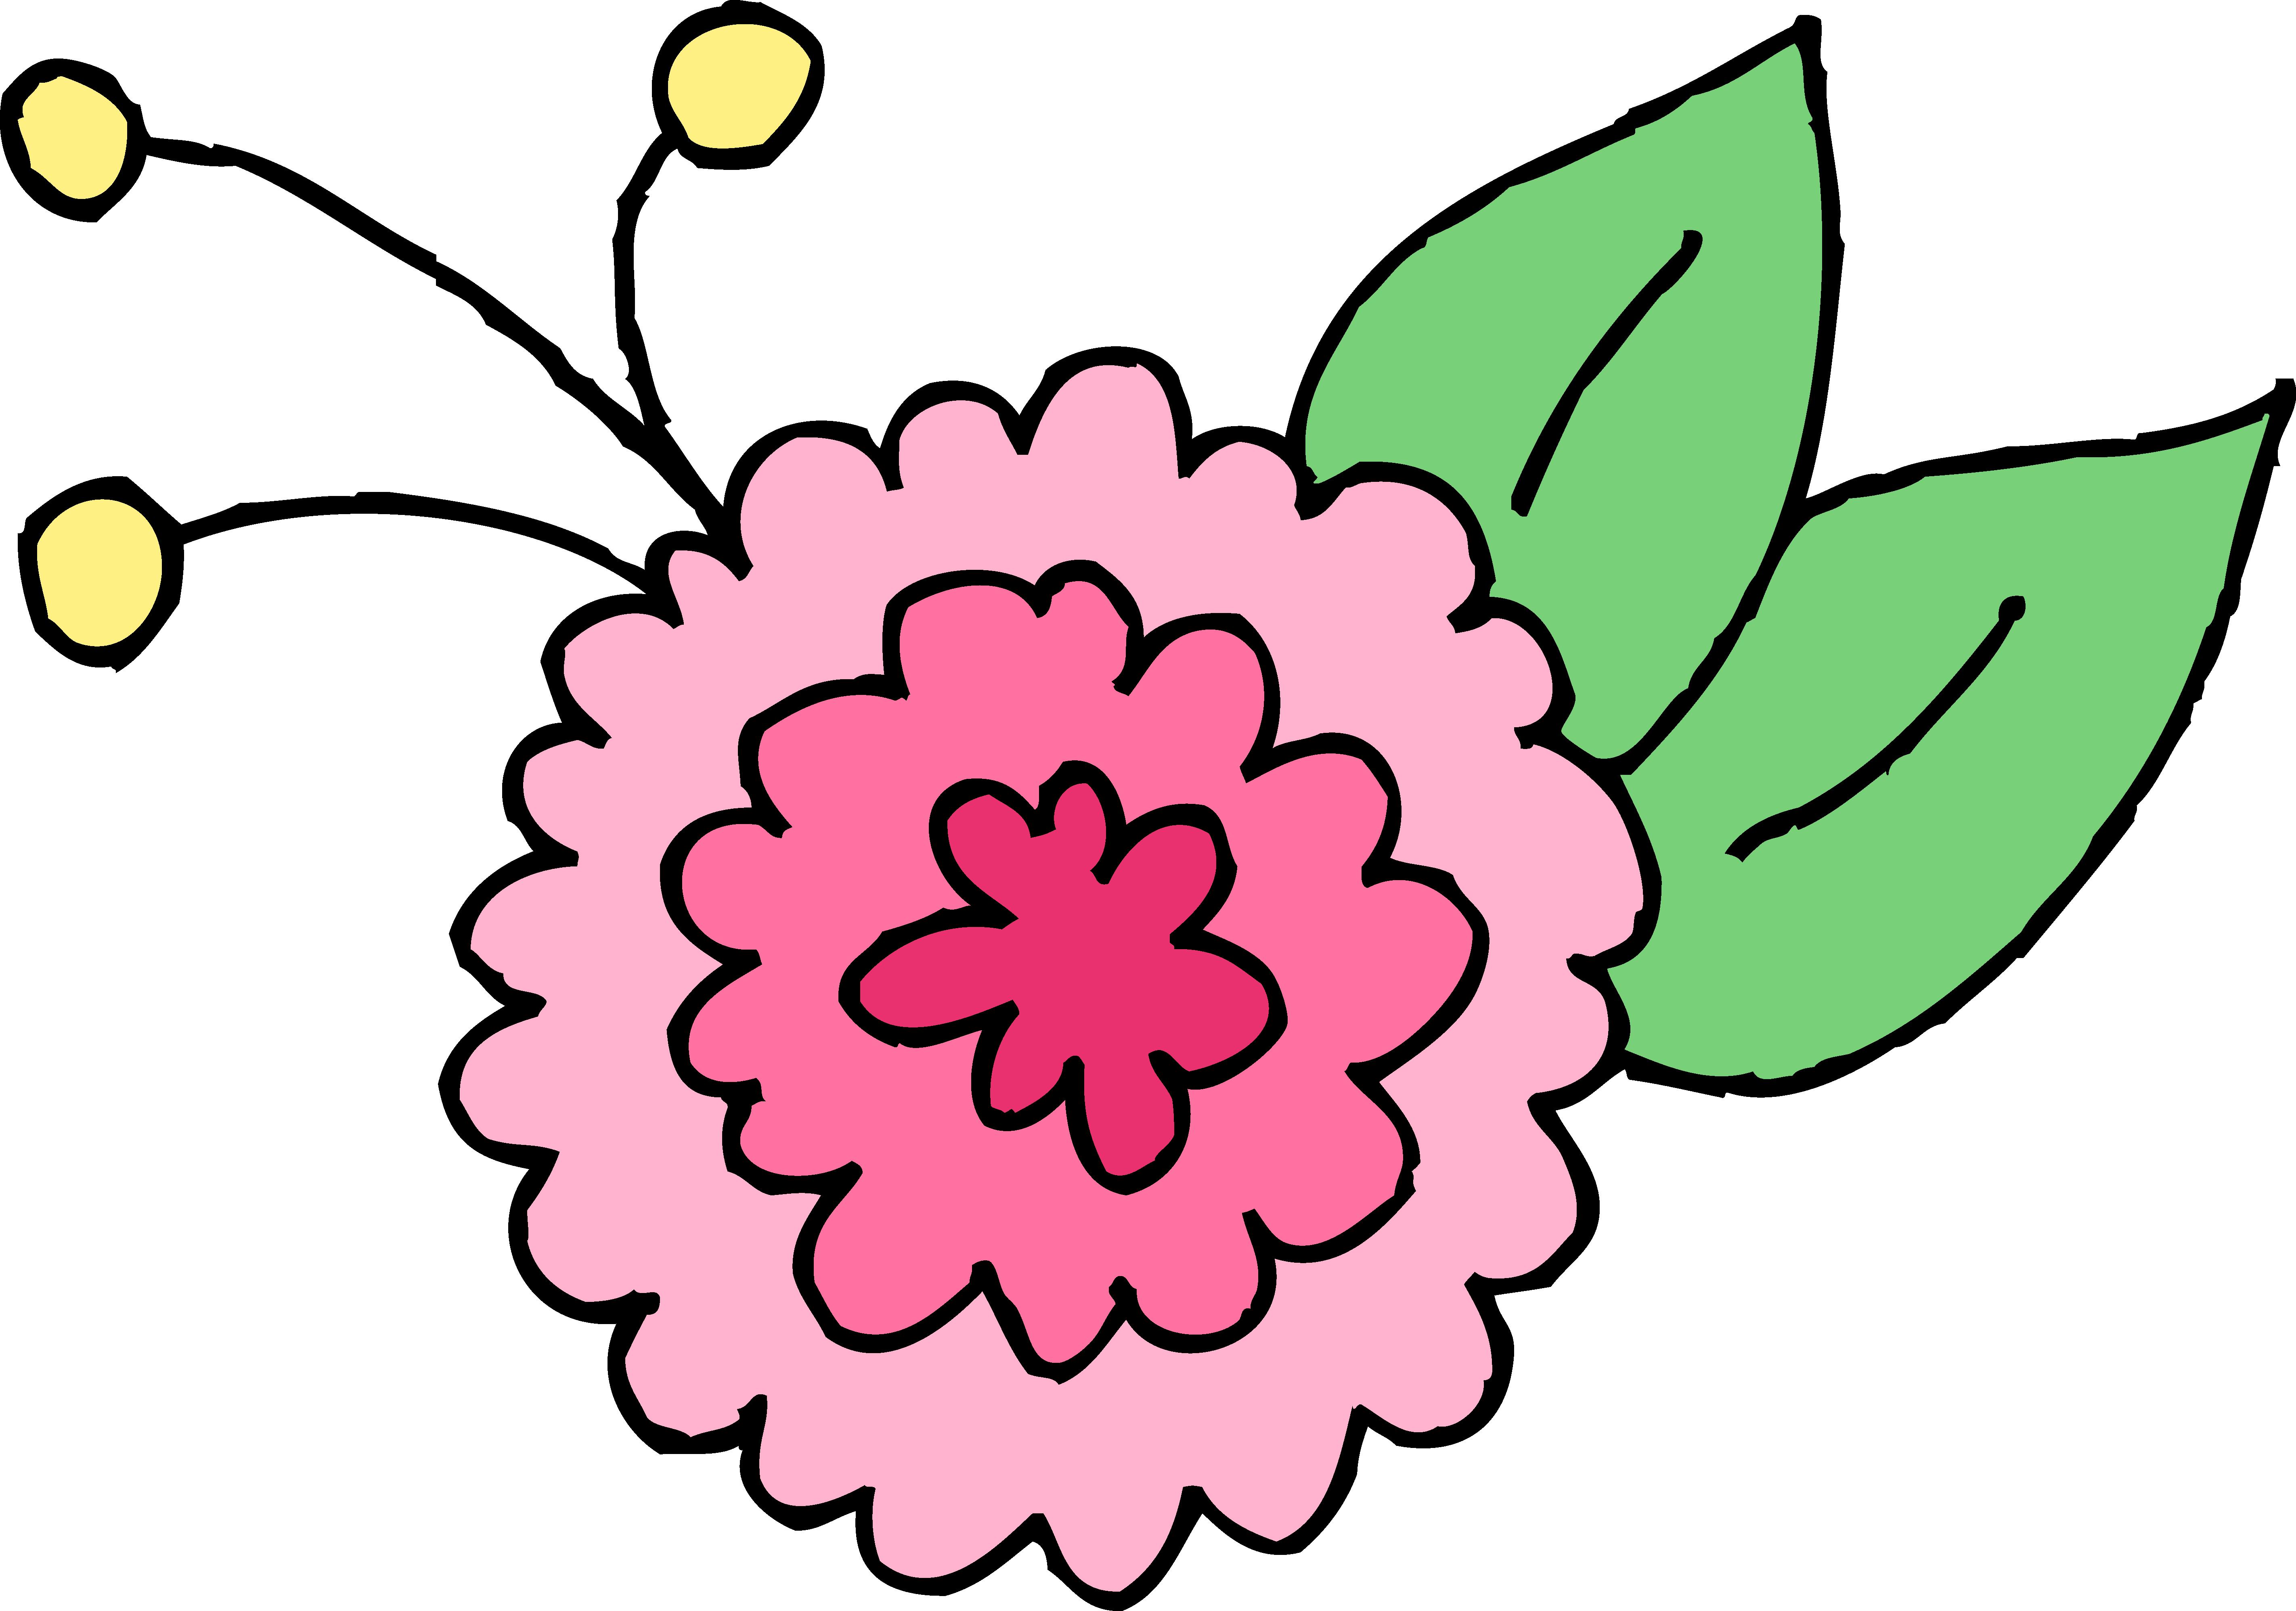 5688x3992 Cute Pink Chrysanthemum Flower